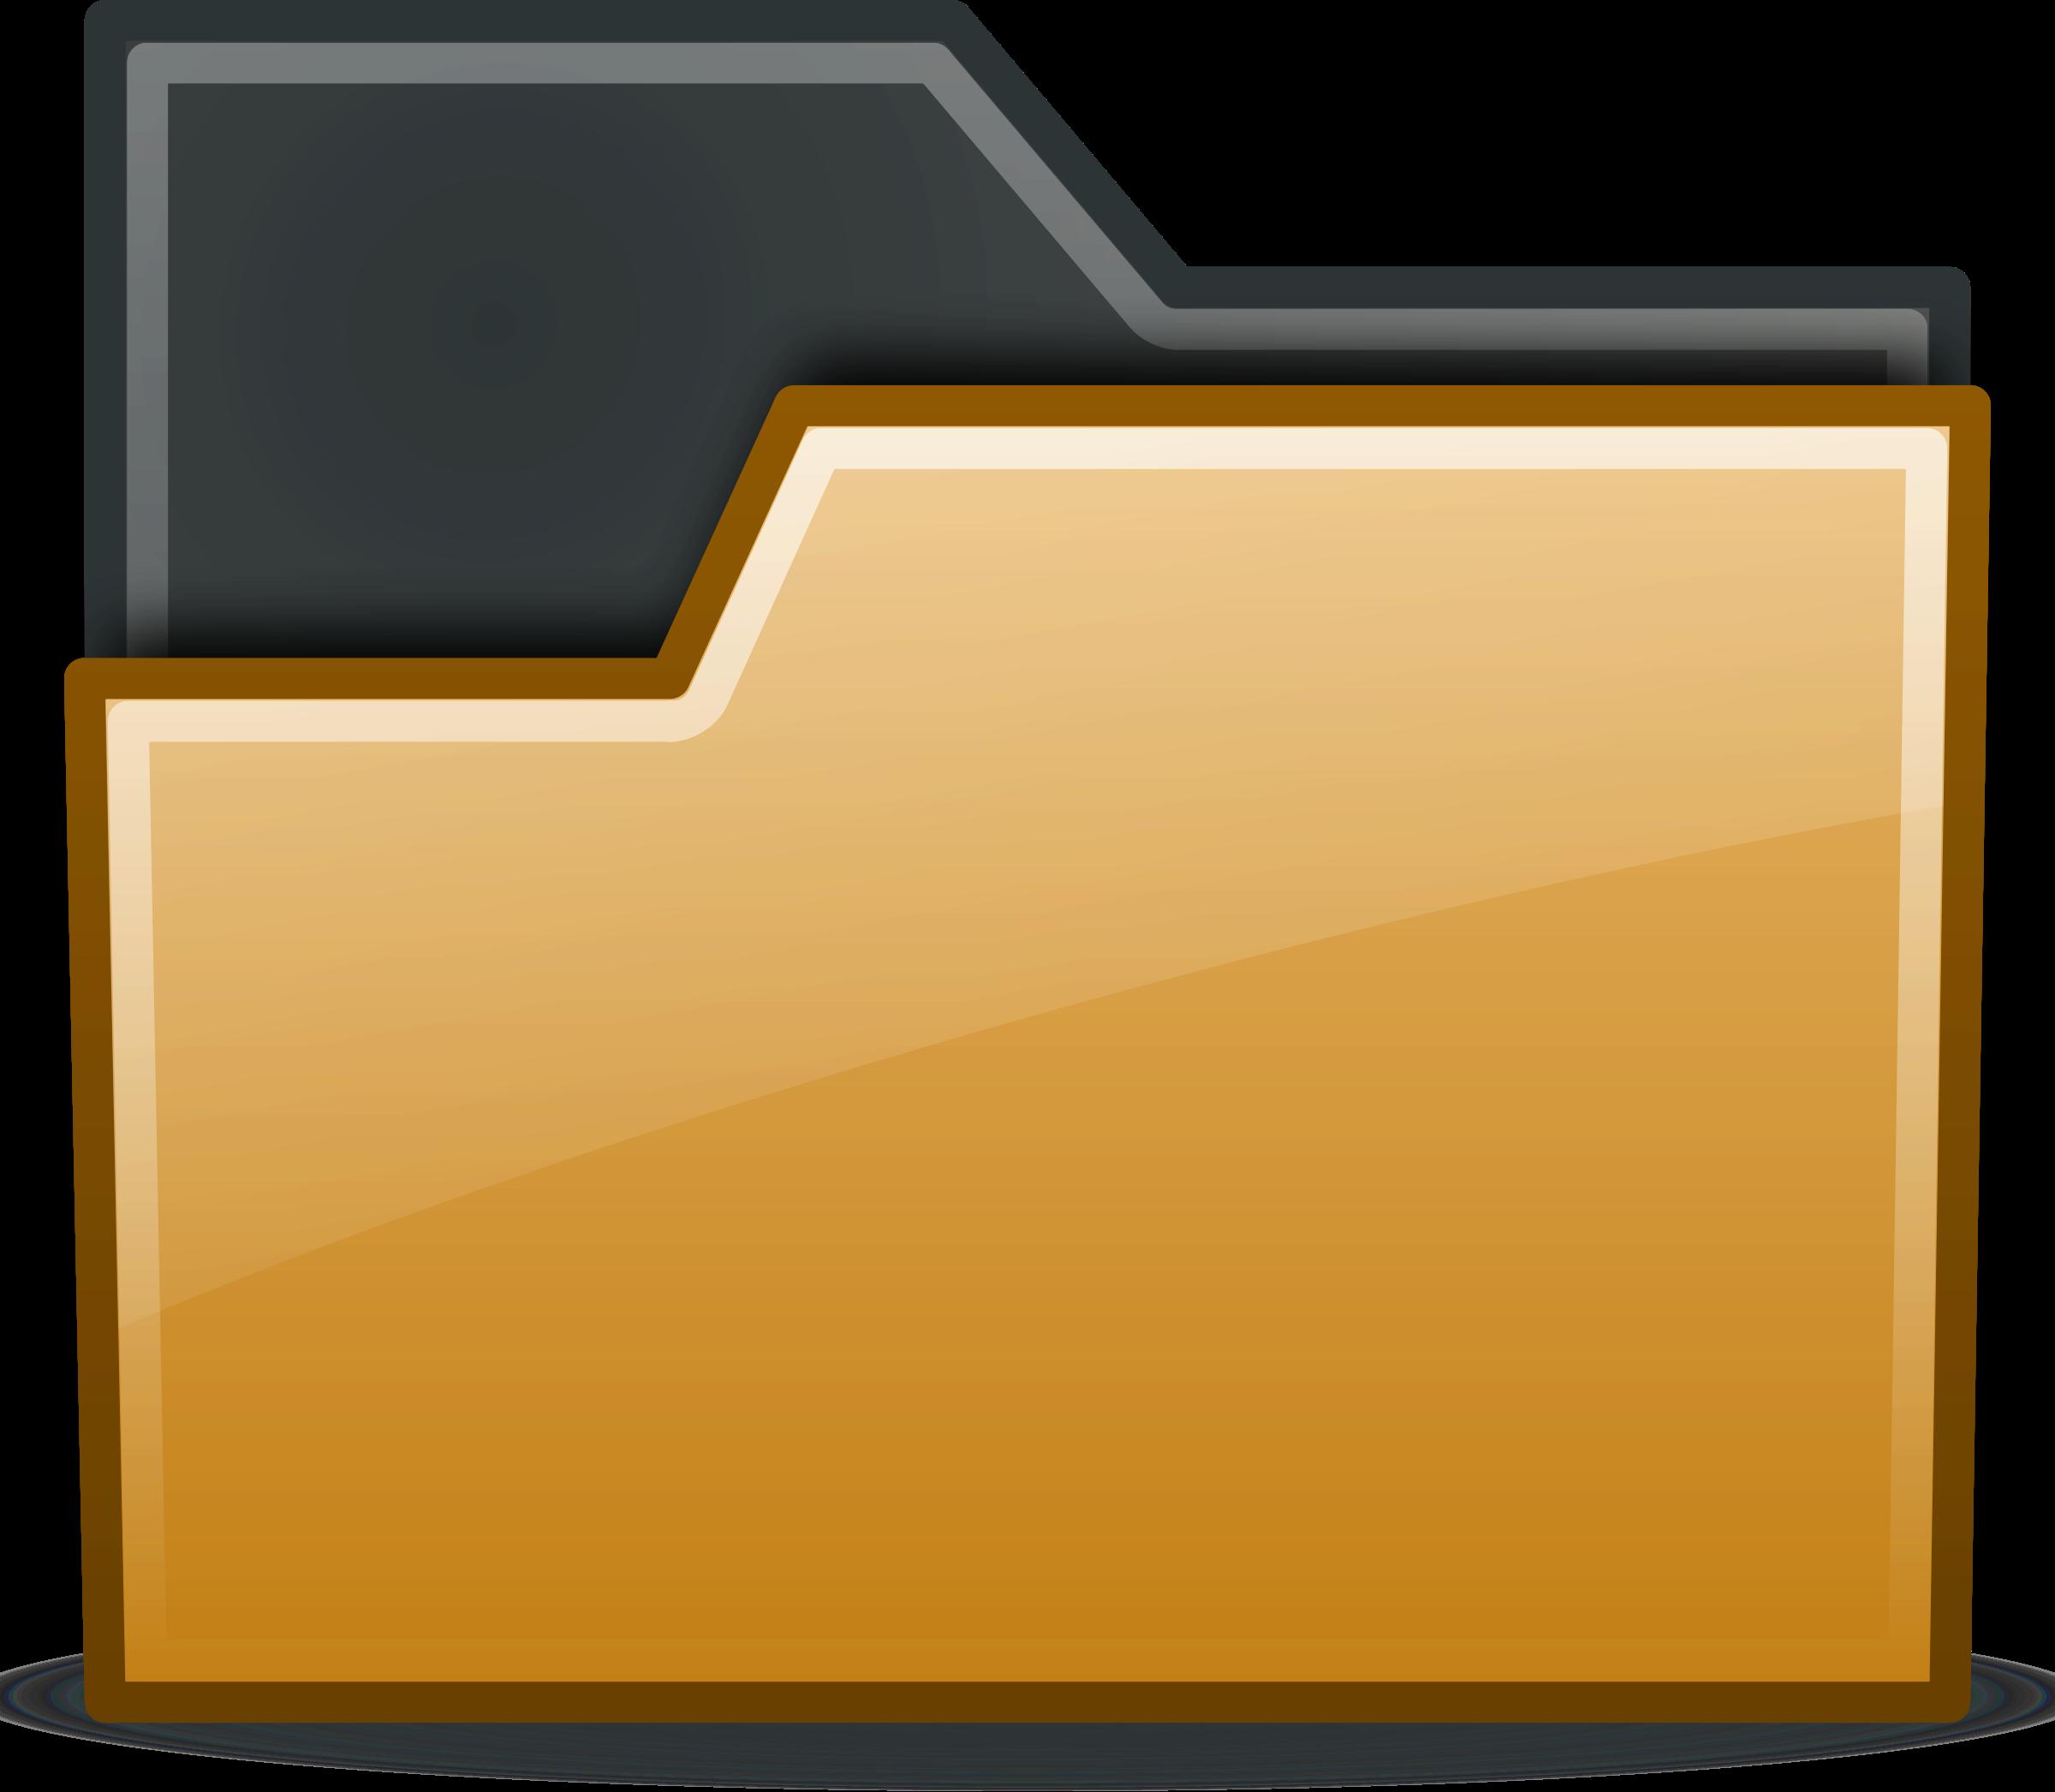 Folder clipart office material. Brown semitransparent big image